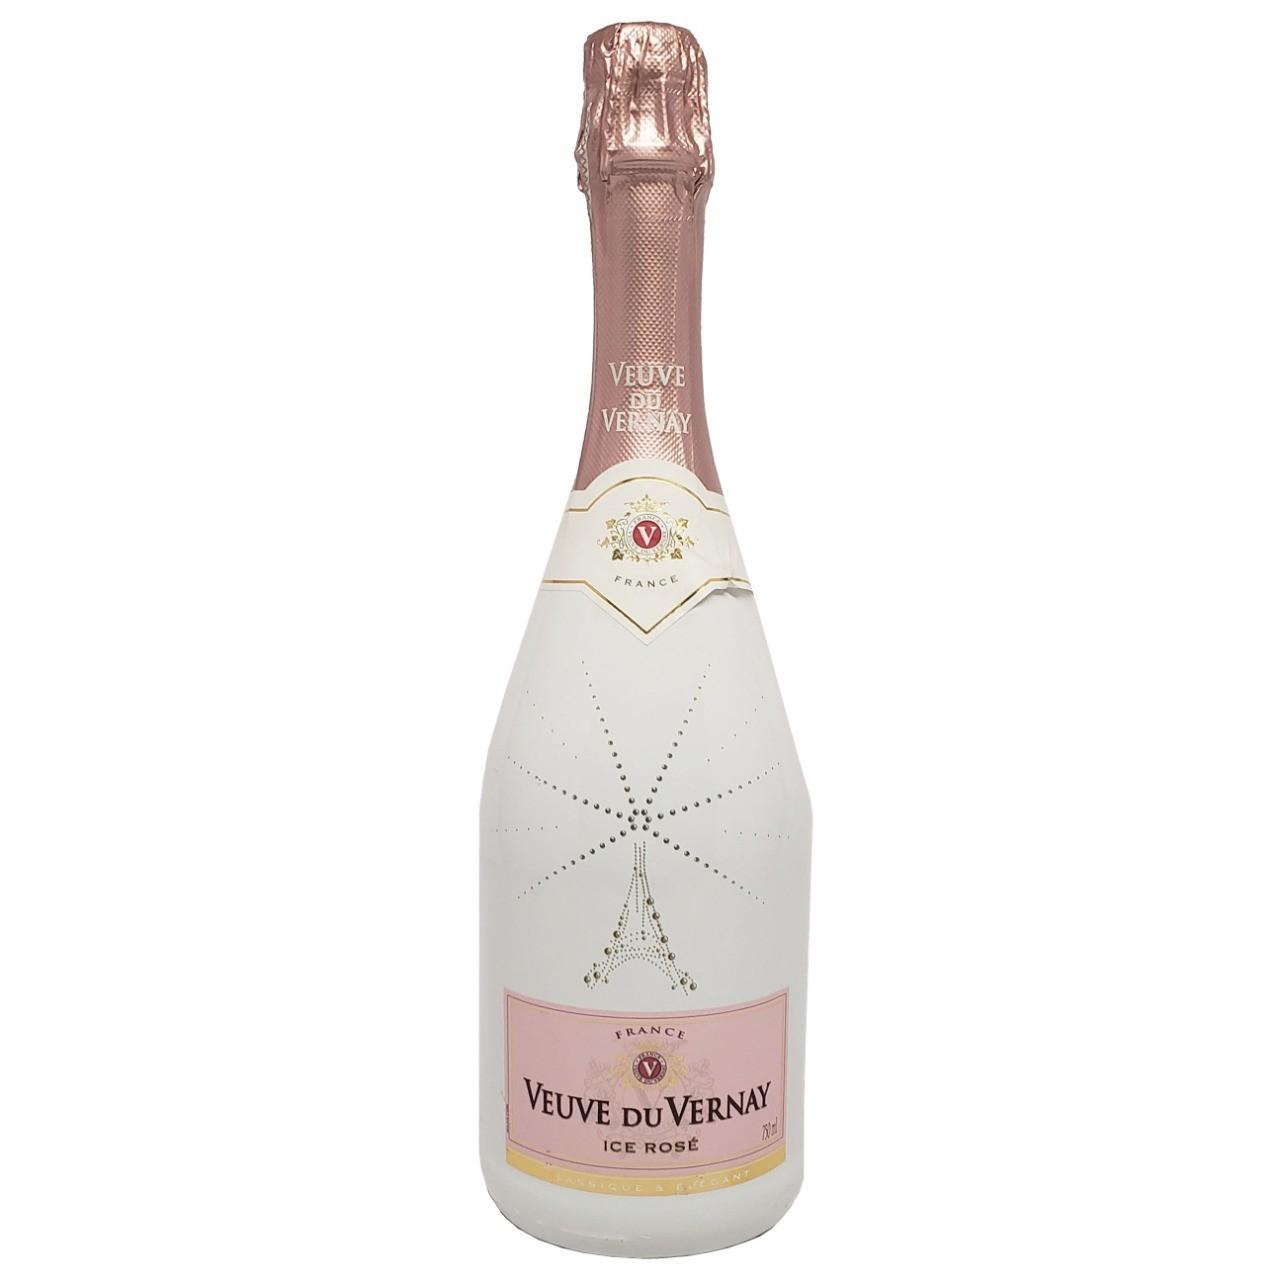 Vinho Espumante Ice Rosé Veuve Du Vernay  - 750ml -